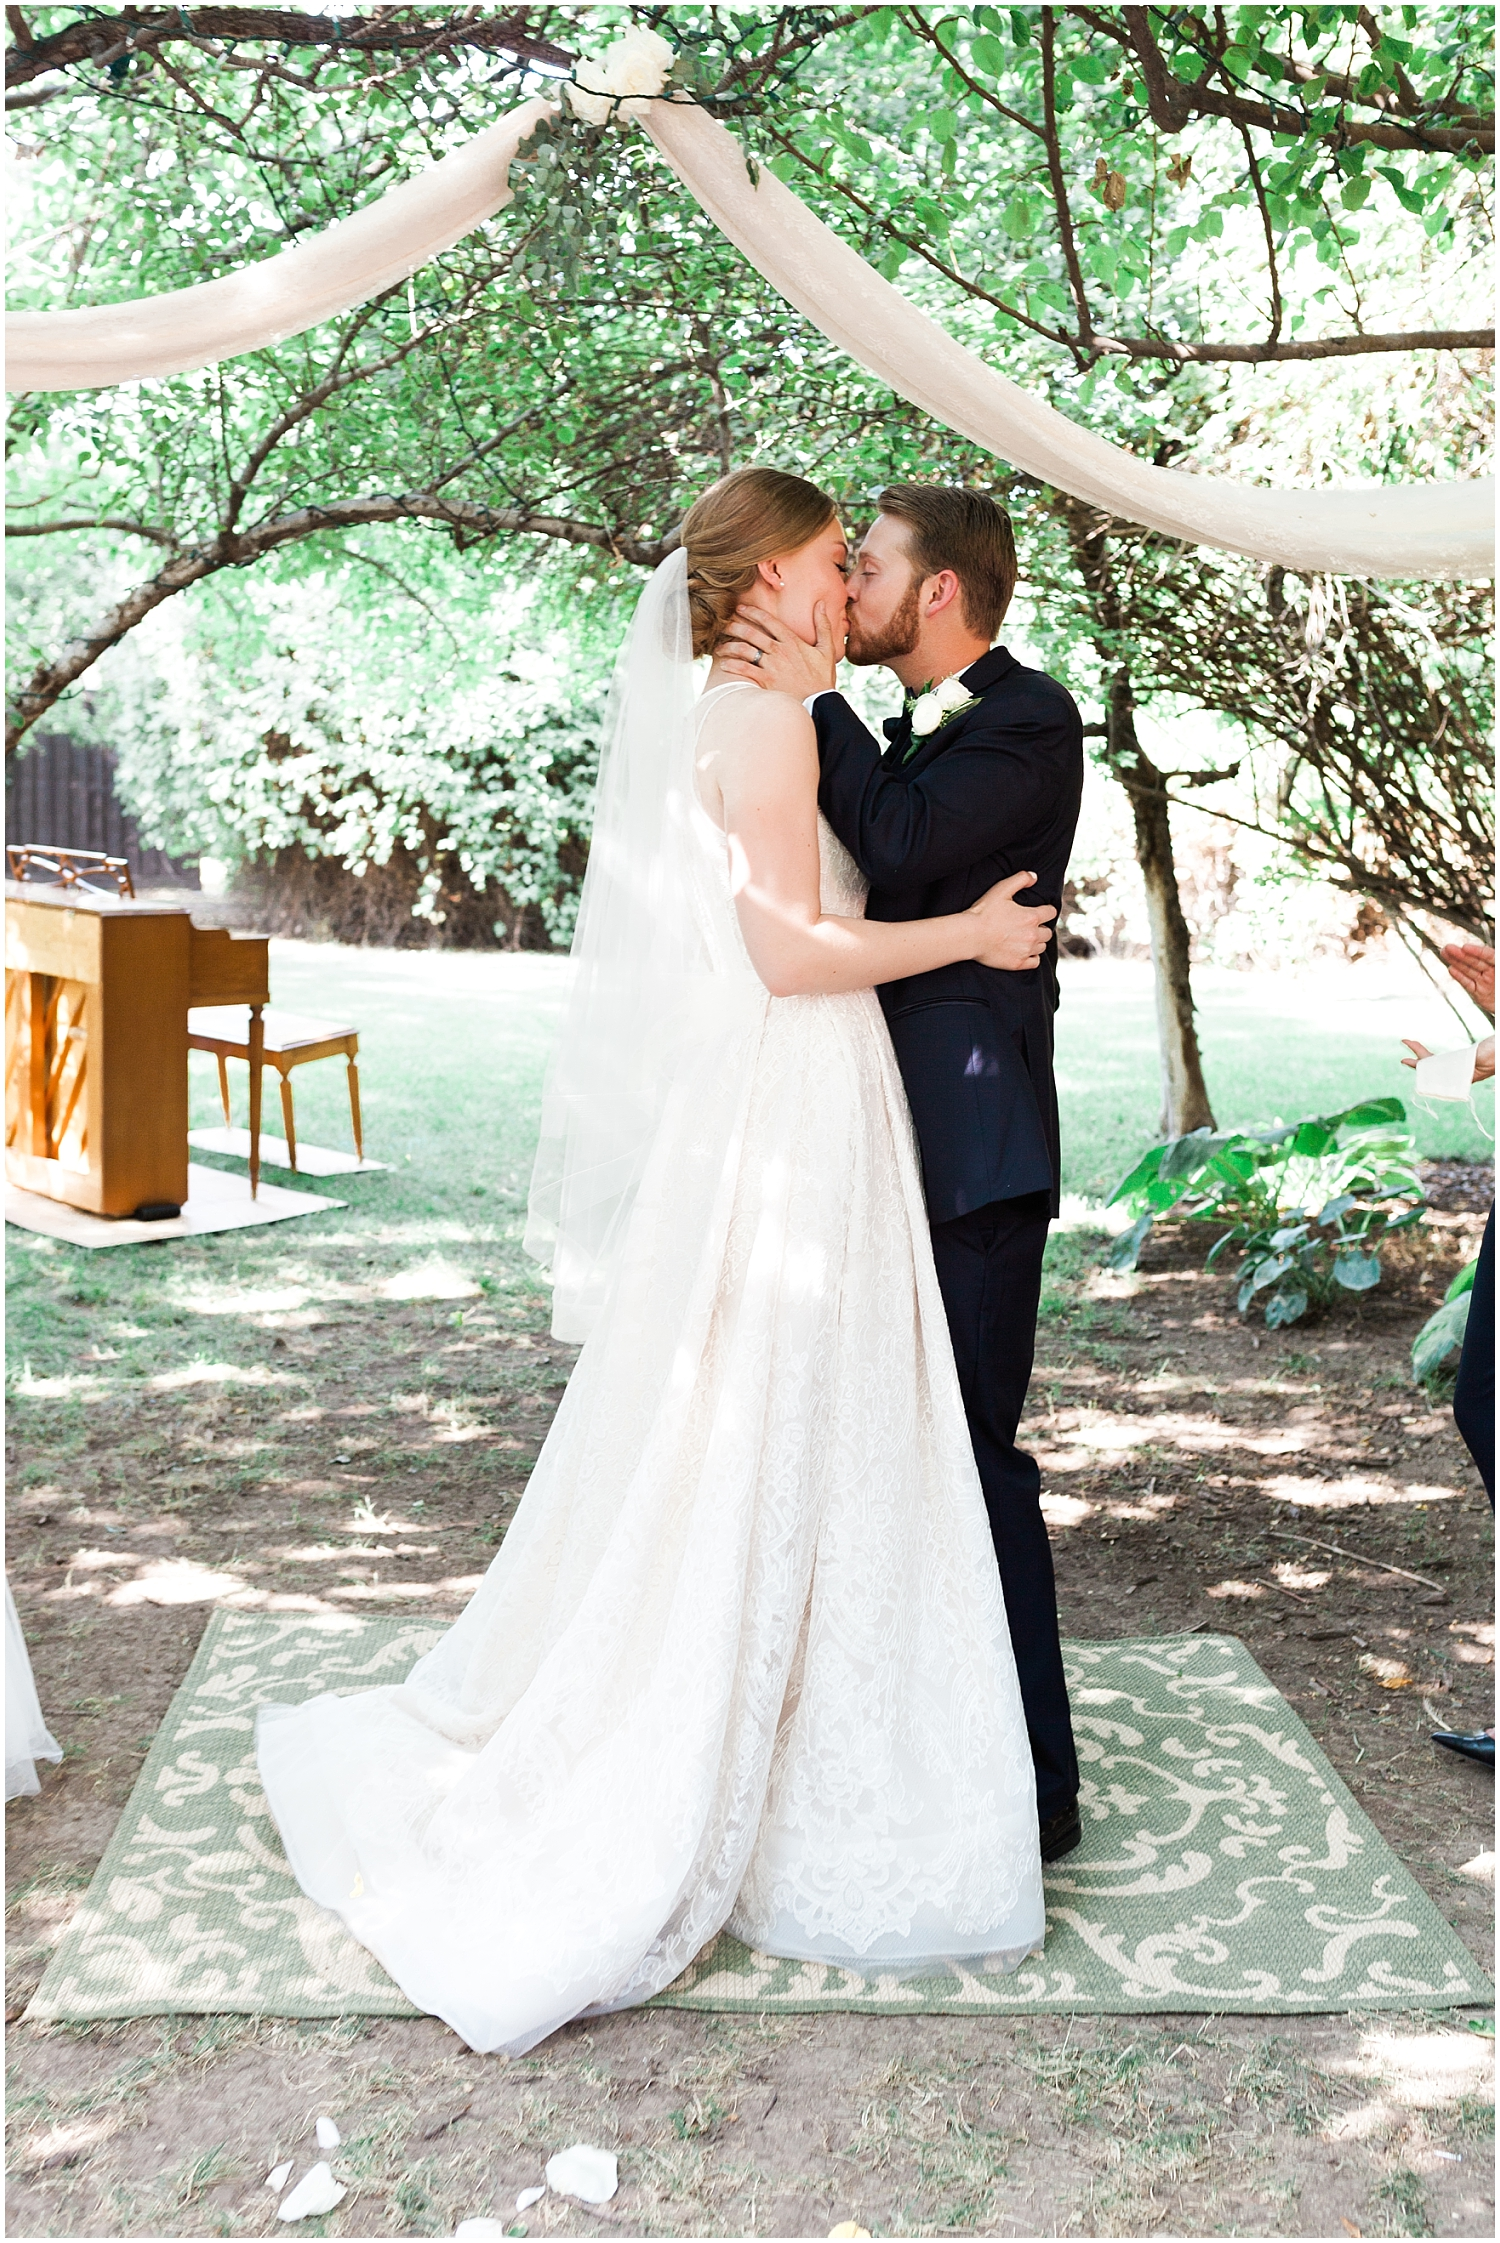 Rachel Reyes Photography-Utah Wedding Photographer-The Villa in Cedar Hills_0041.jpg